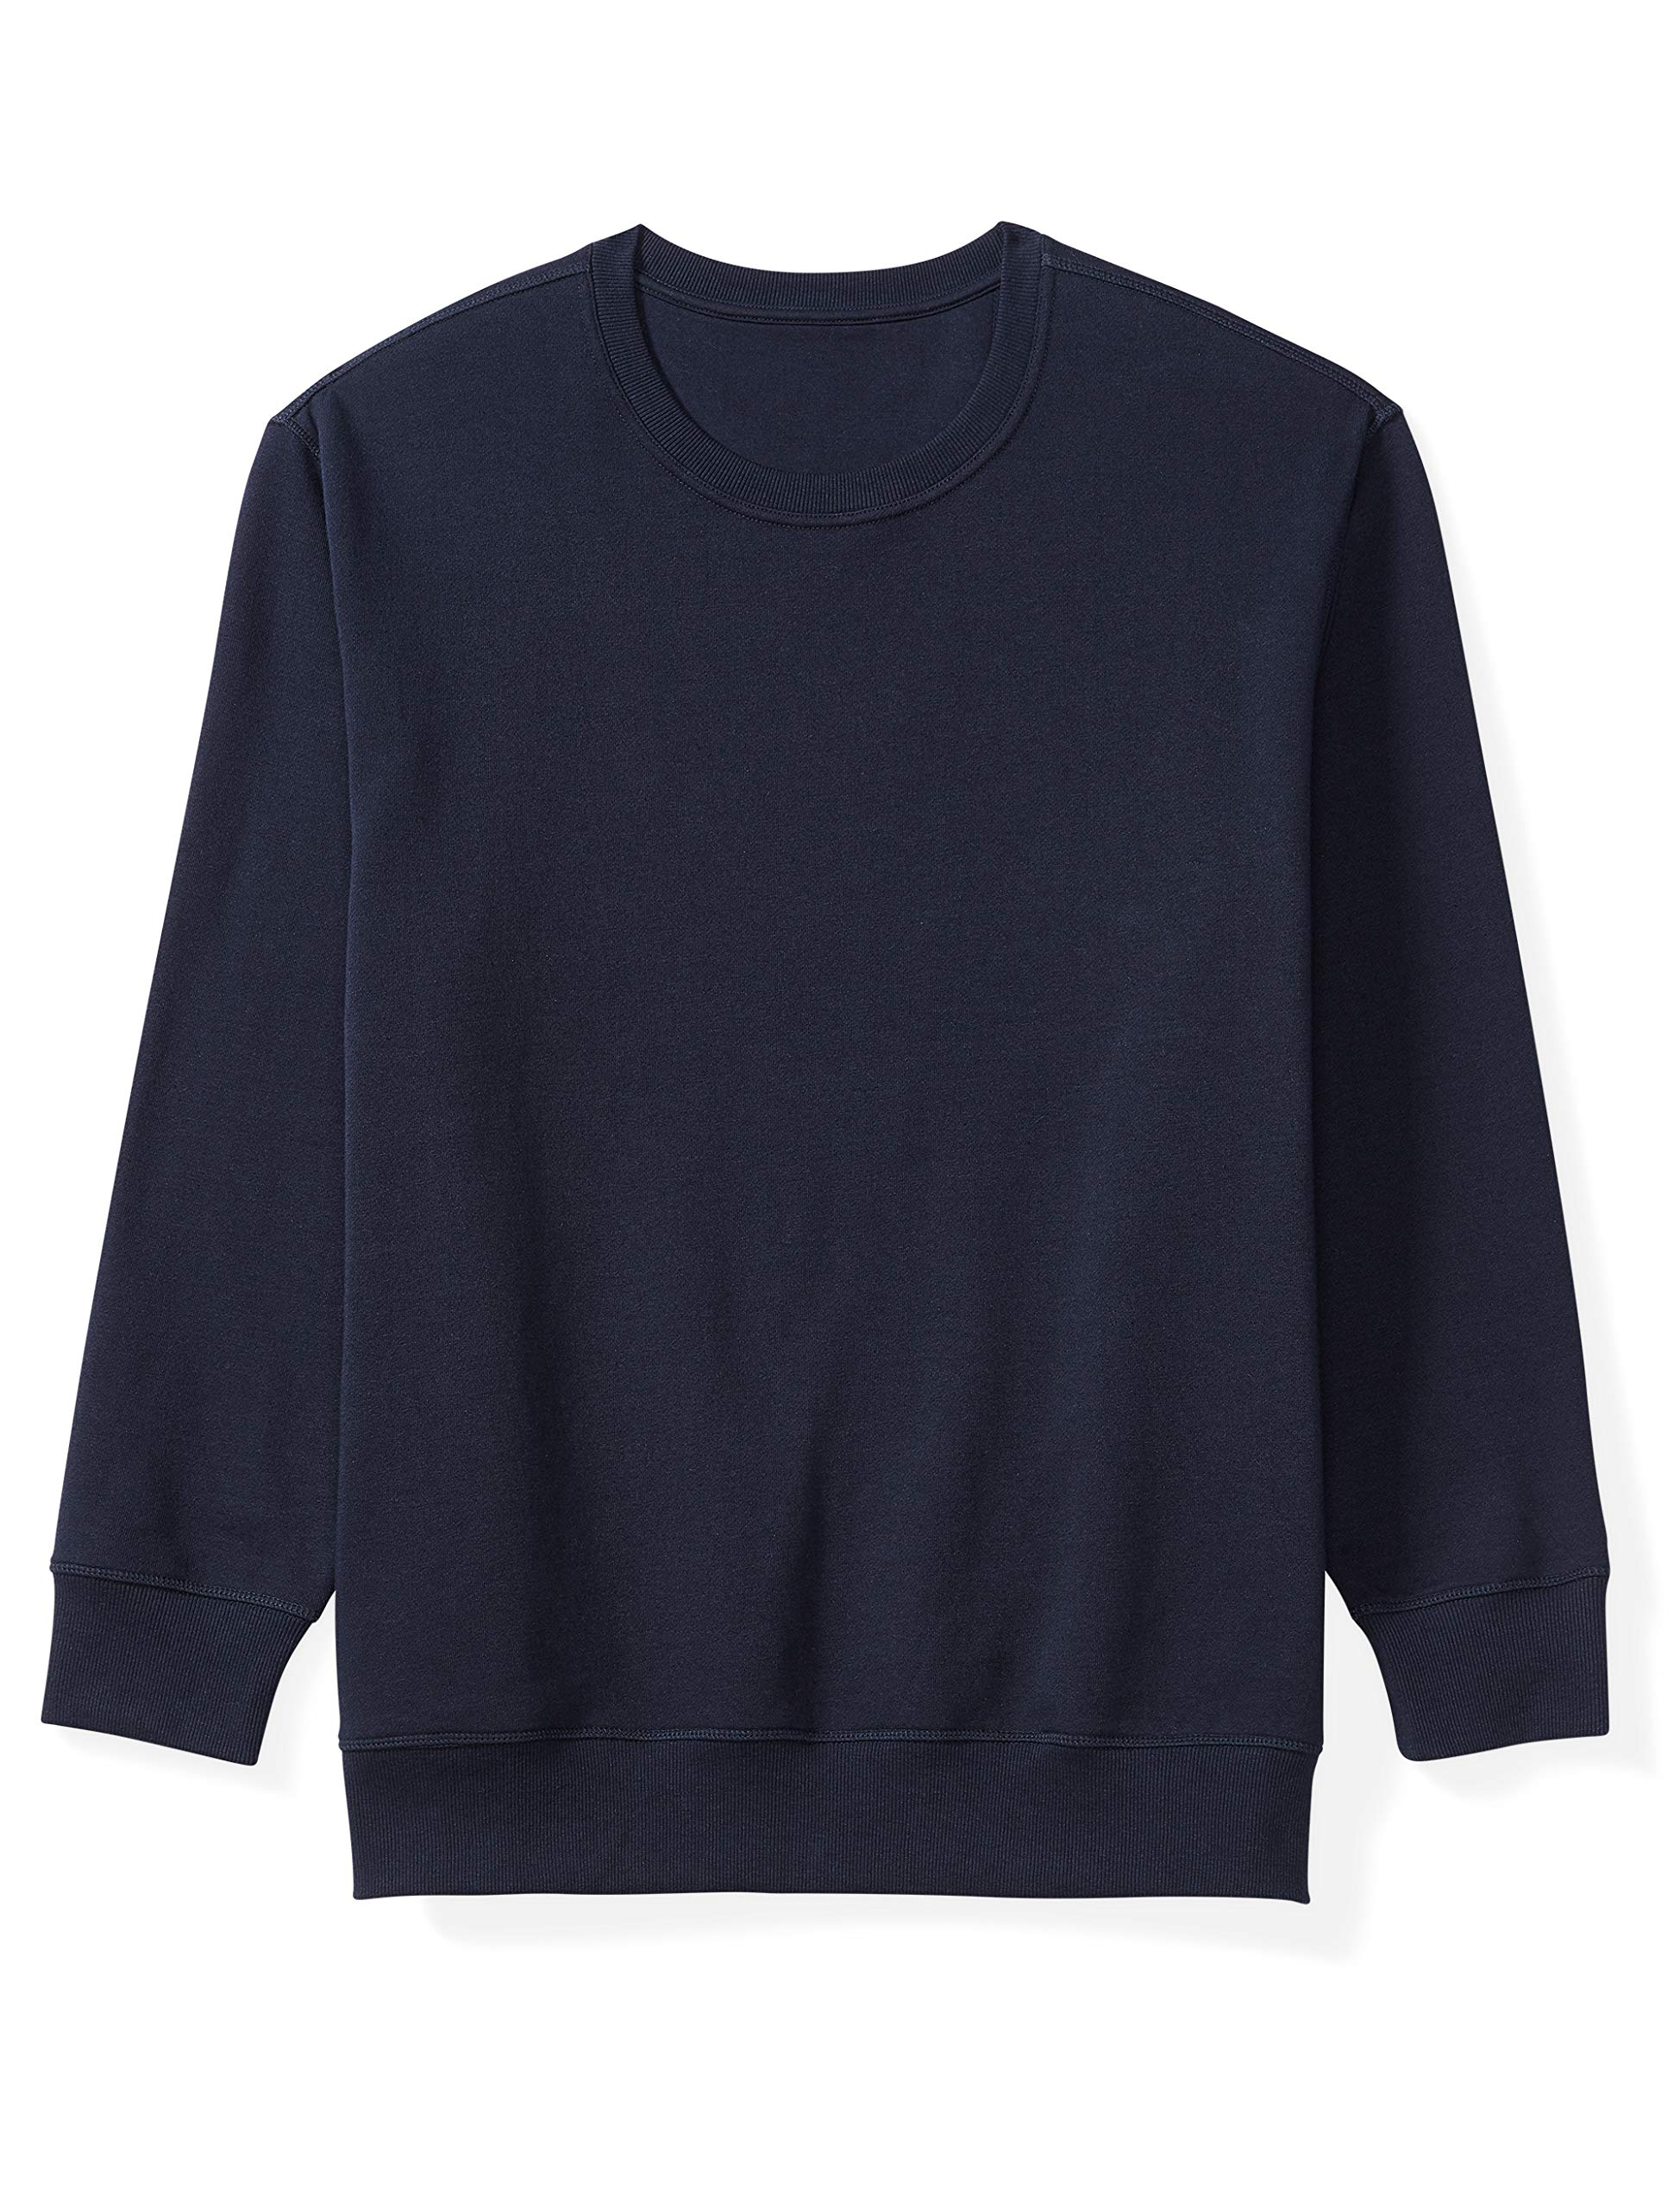 Amazon Essentials Men's Big and Tall Crewneck Fleece Sweatshirt fit by DXL, Navy, 4X by Amazon Essentials